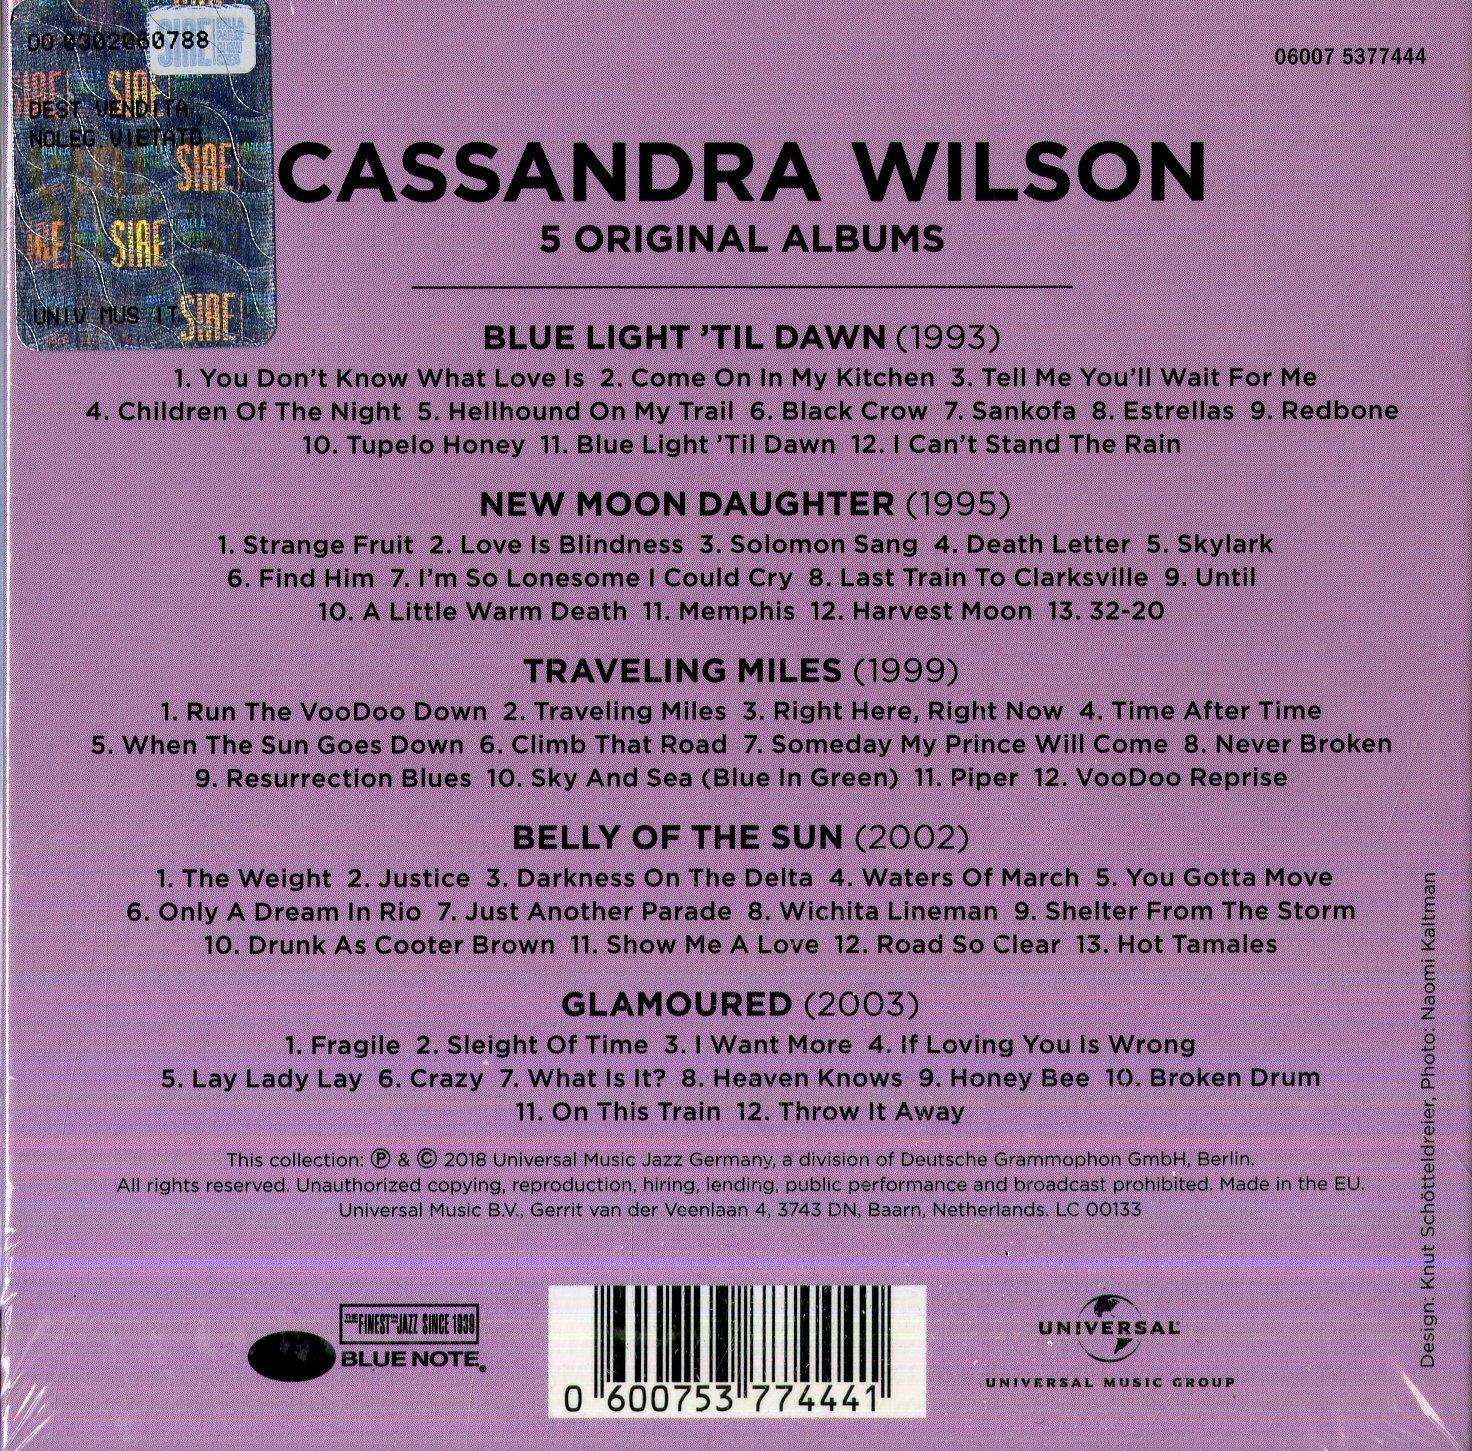 5 Original Albums - Cassandra Wilson: Amazon.de: Musik